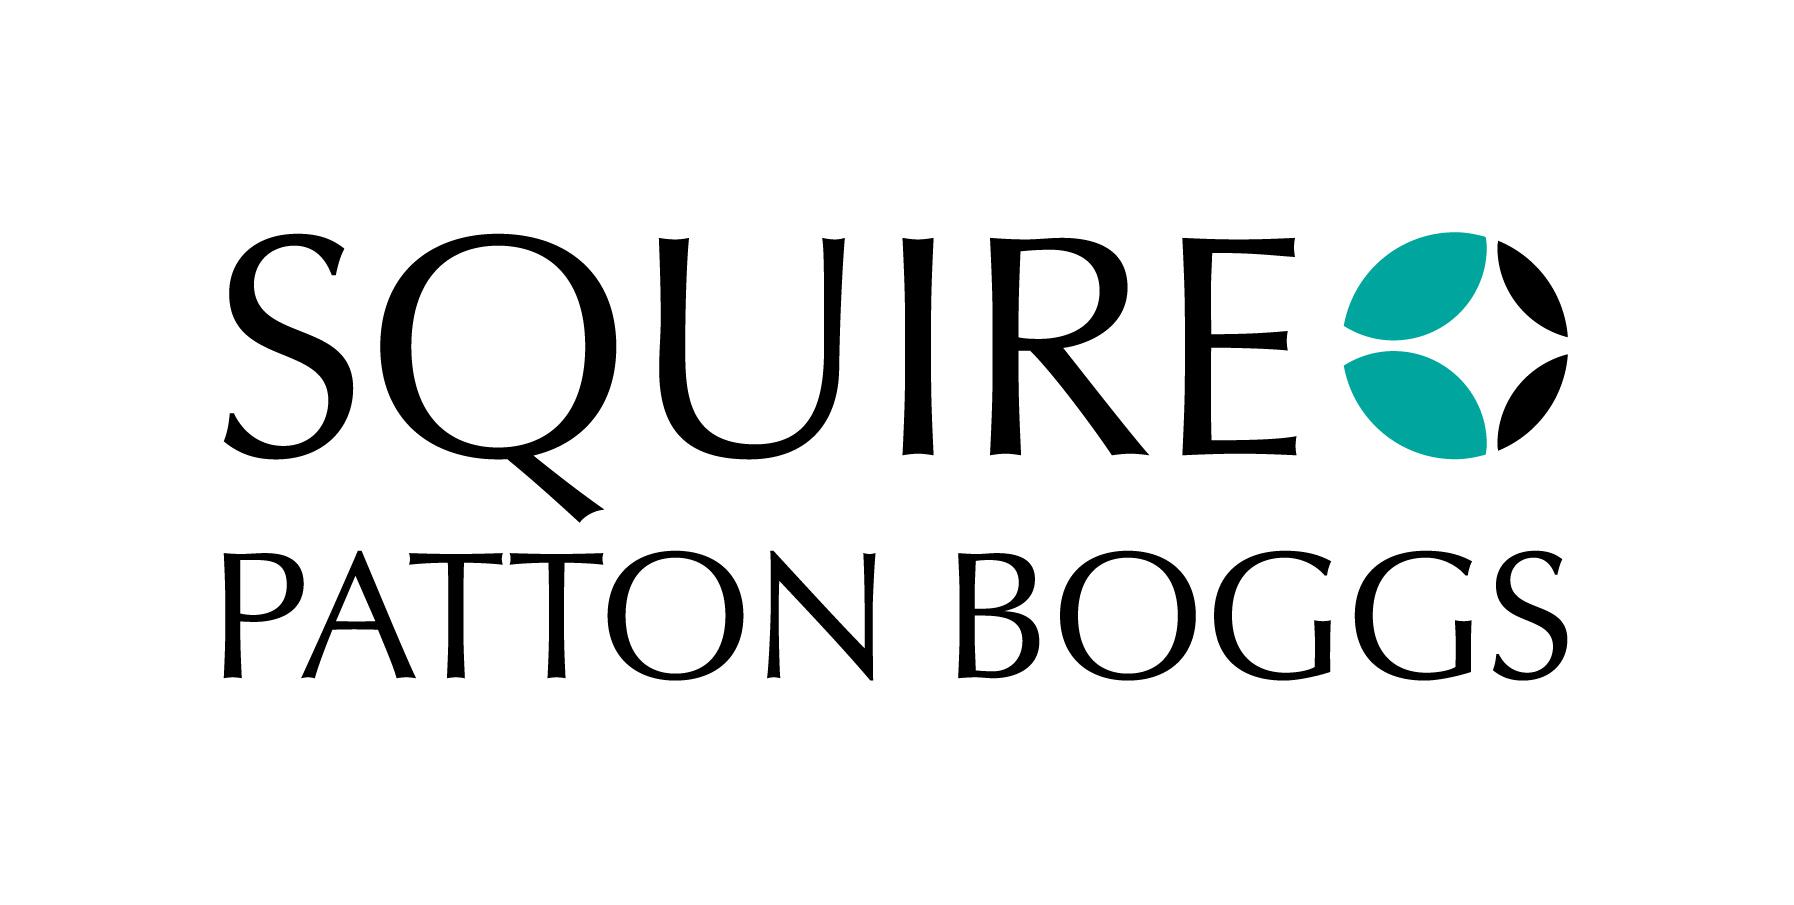 Squire Patton Boggs logo